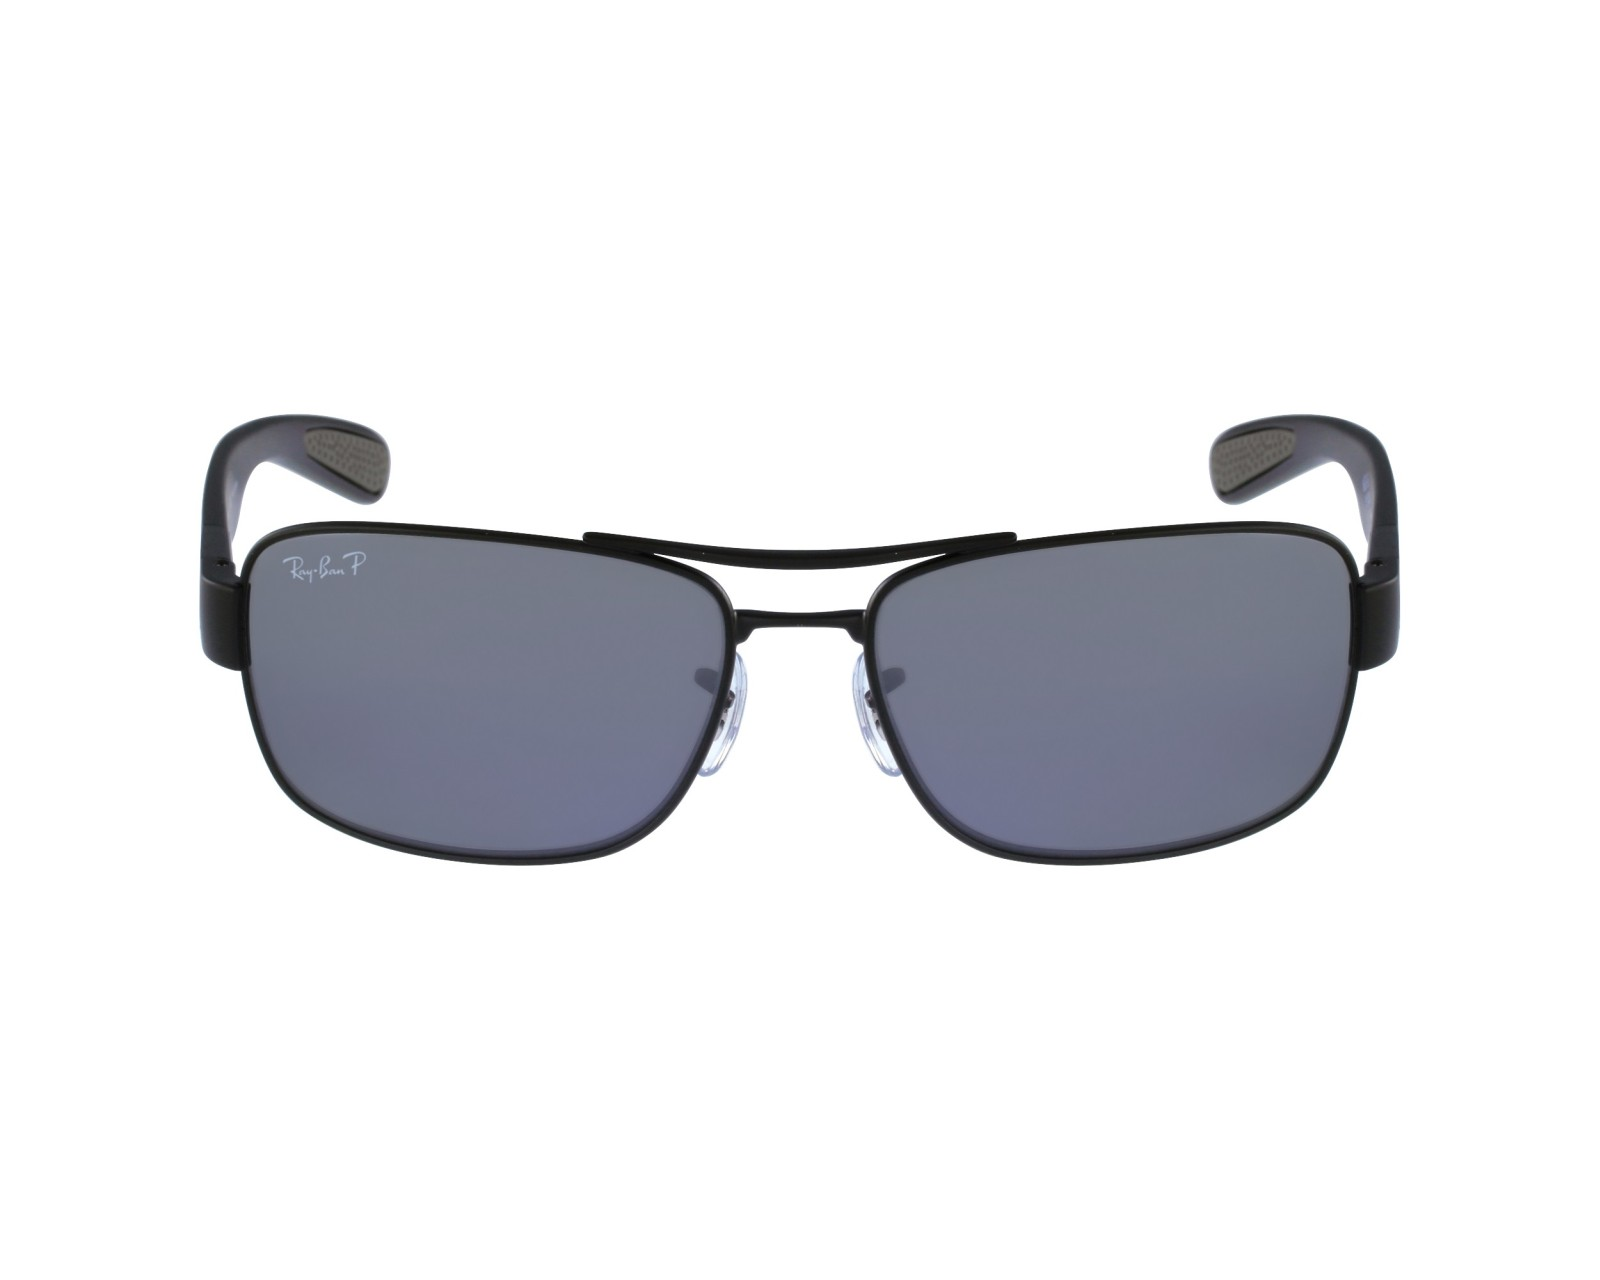 87263bc9ab7 thumbnail Sunglasses Ray-Ban RB-3522 006 82 - Black profile view